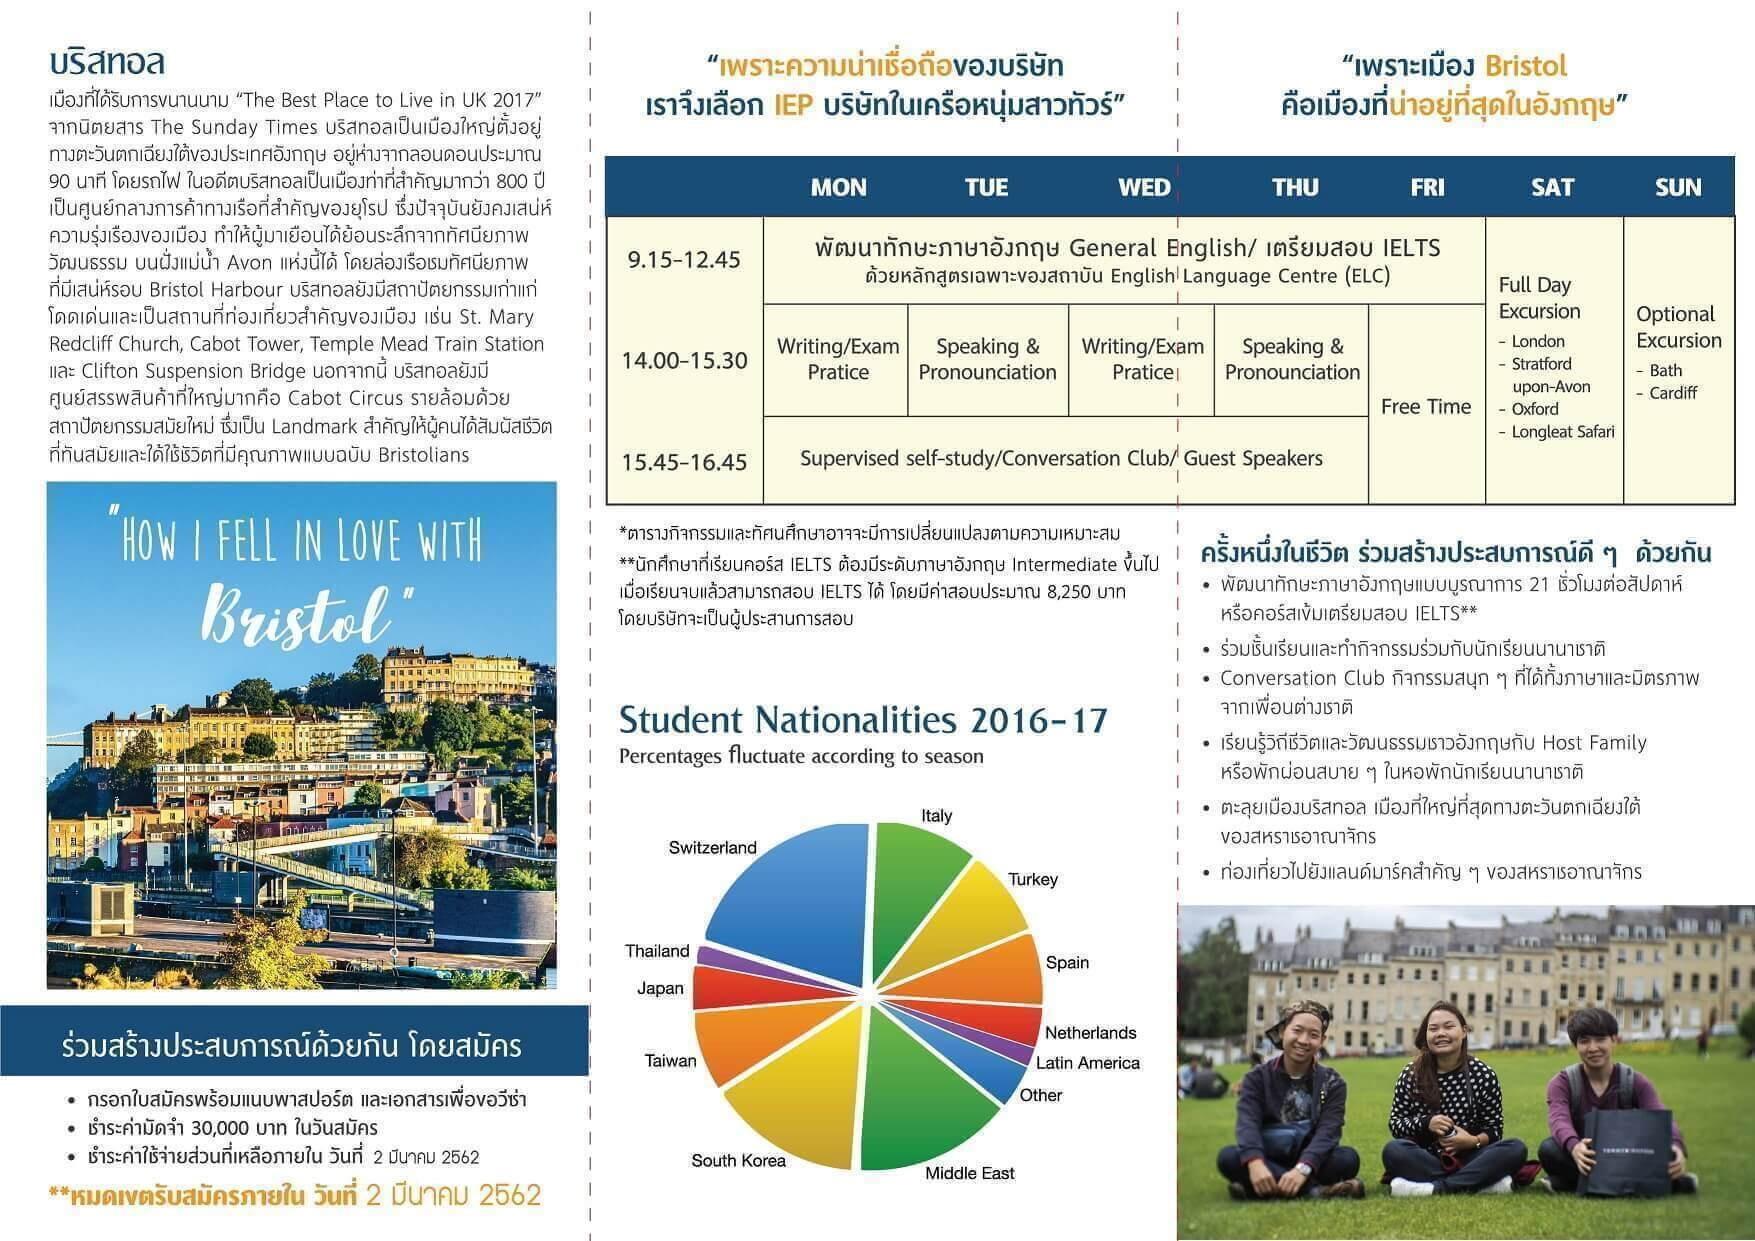 English Language Centre-Schedule of ELC Bristol English Summer Camp April 2019 in UK